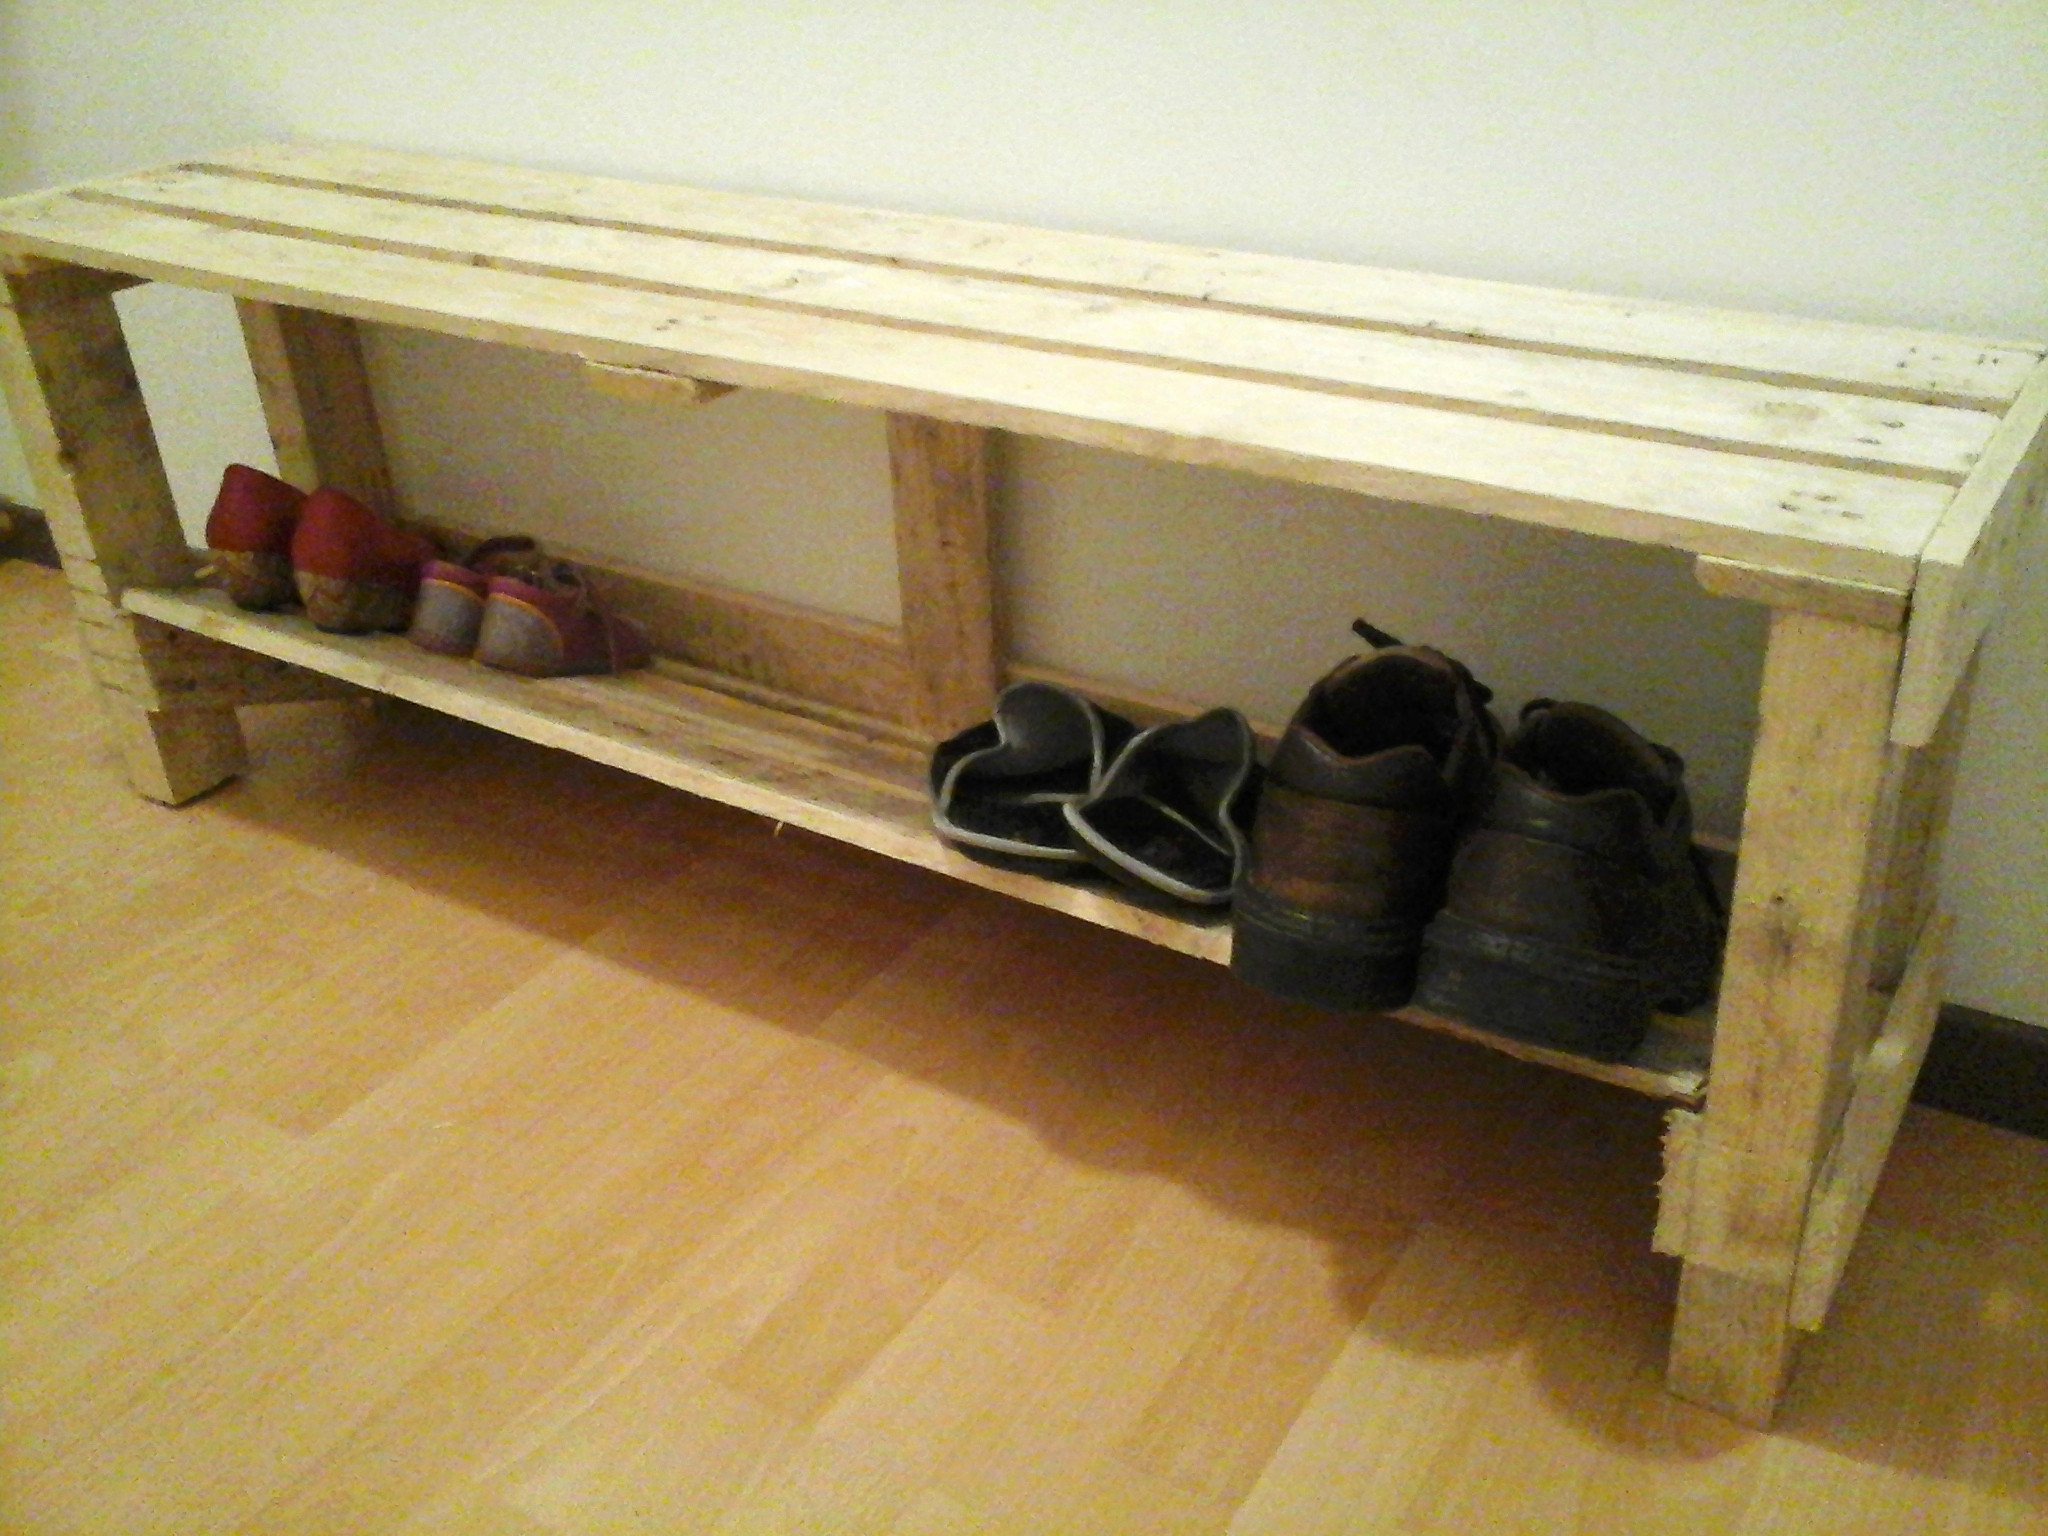 faire un meuble en bois fabriquer un meuble tv faire un meuble tv meuble tv bois brut of faire un meuble en bois